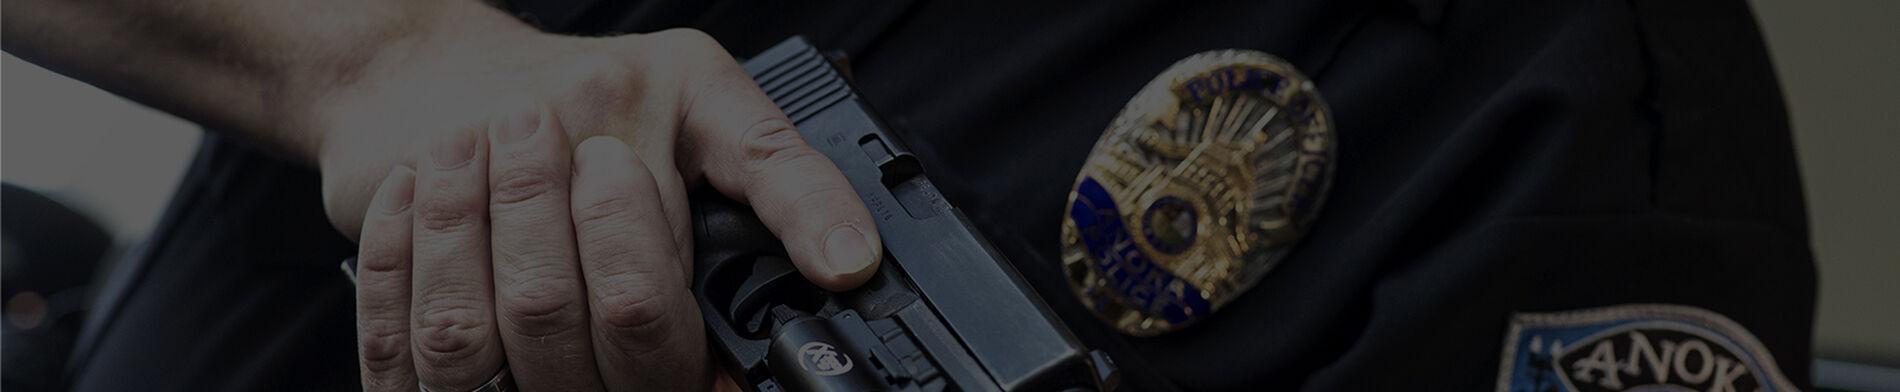 police holding a handgun